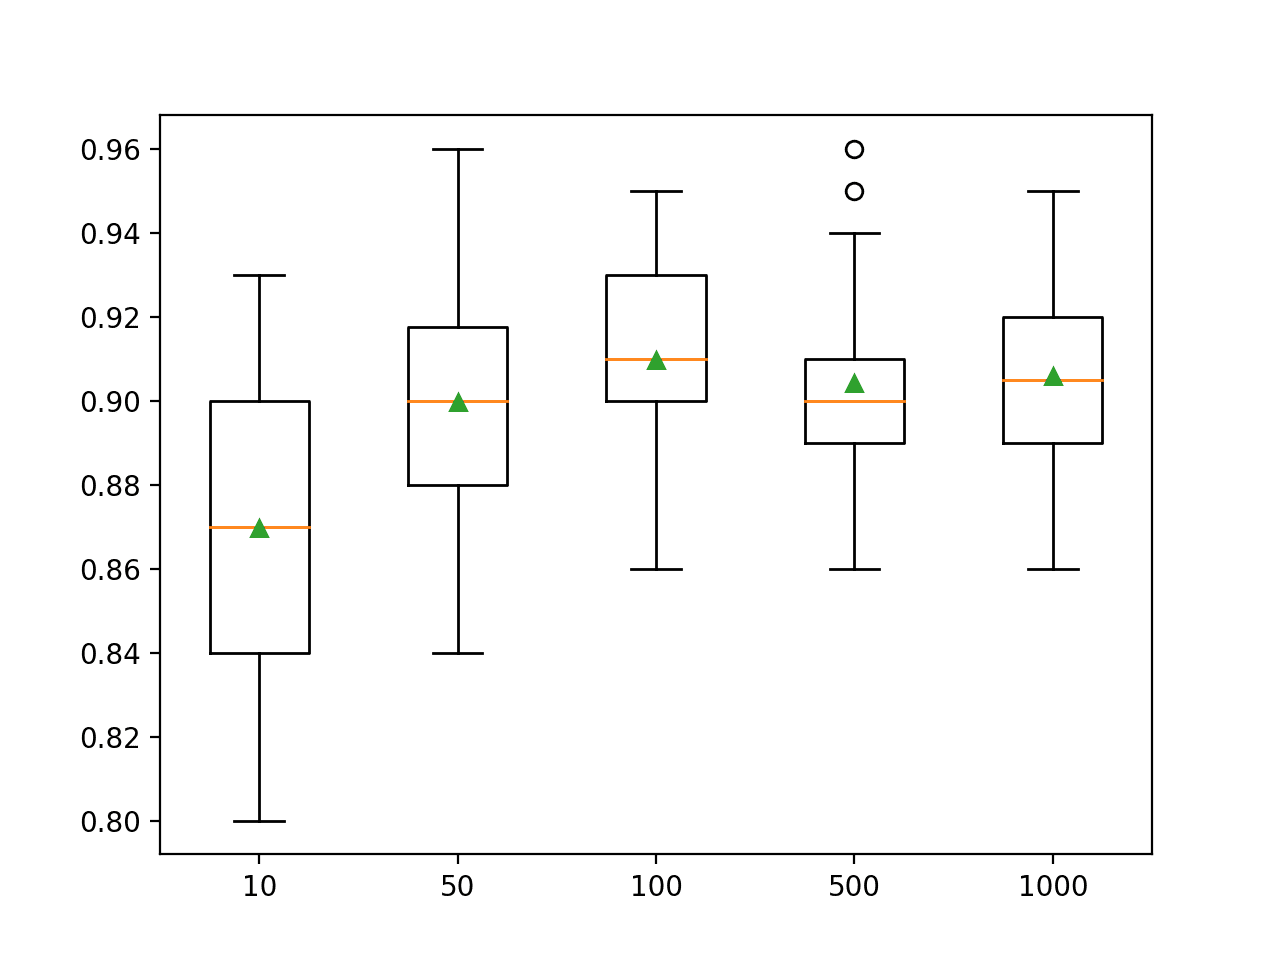 Box Plot of Random Forest Ensemble Size vs. Classification Accuracy